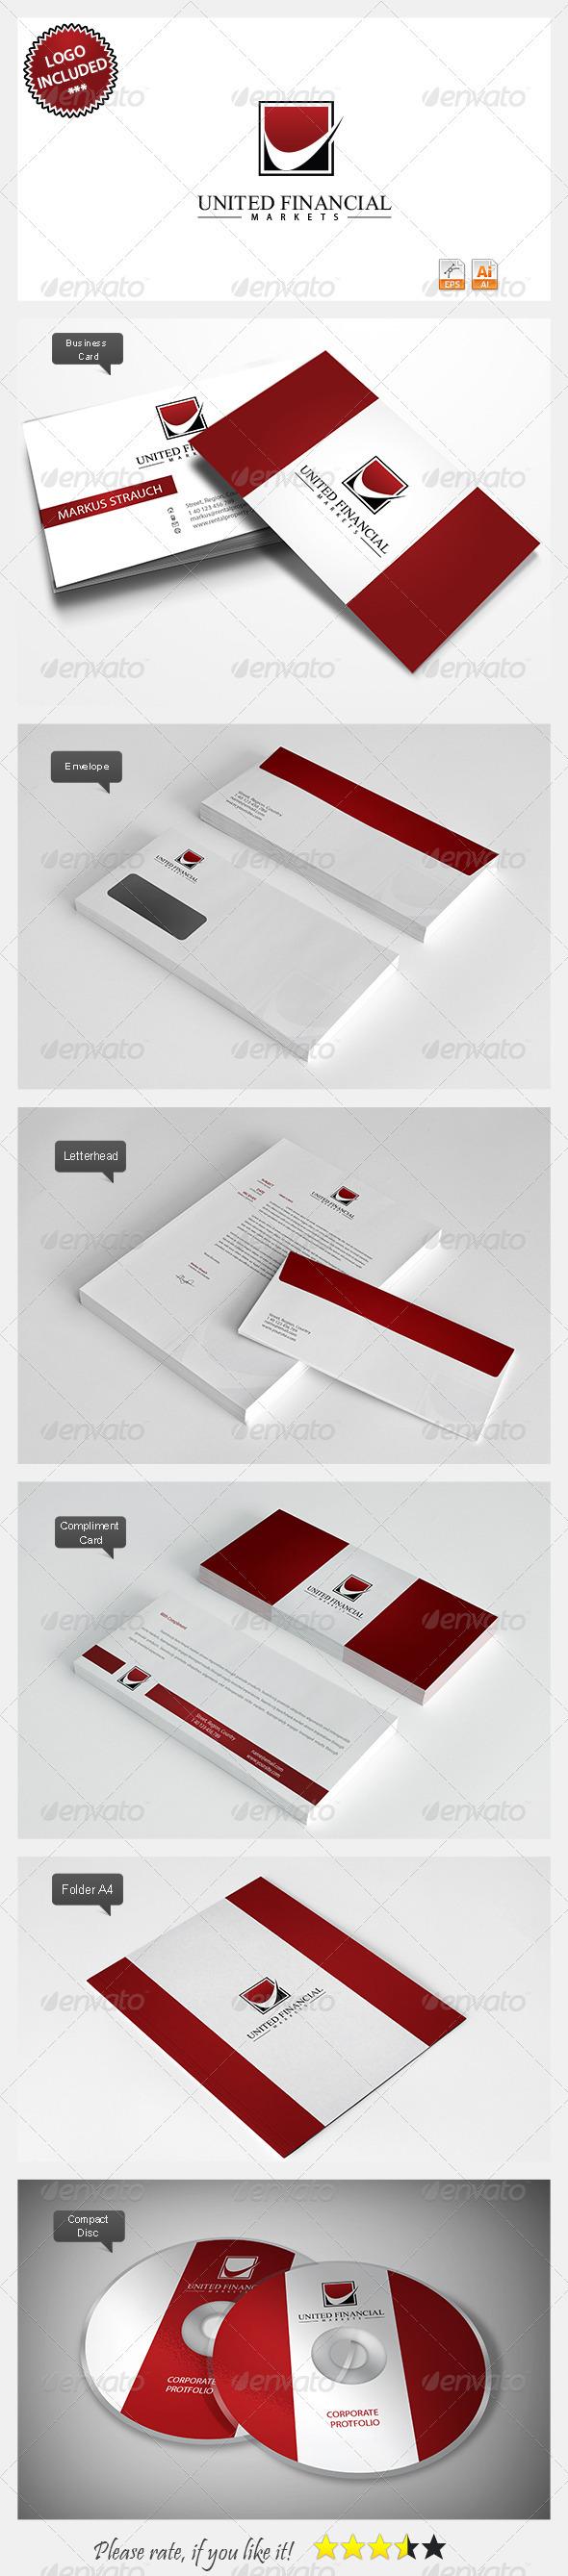 GraphicRiver United Financial Logo & Identity 3822966